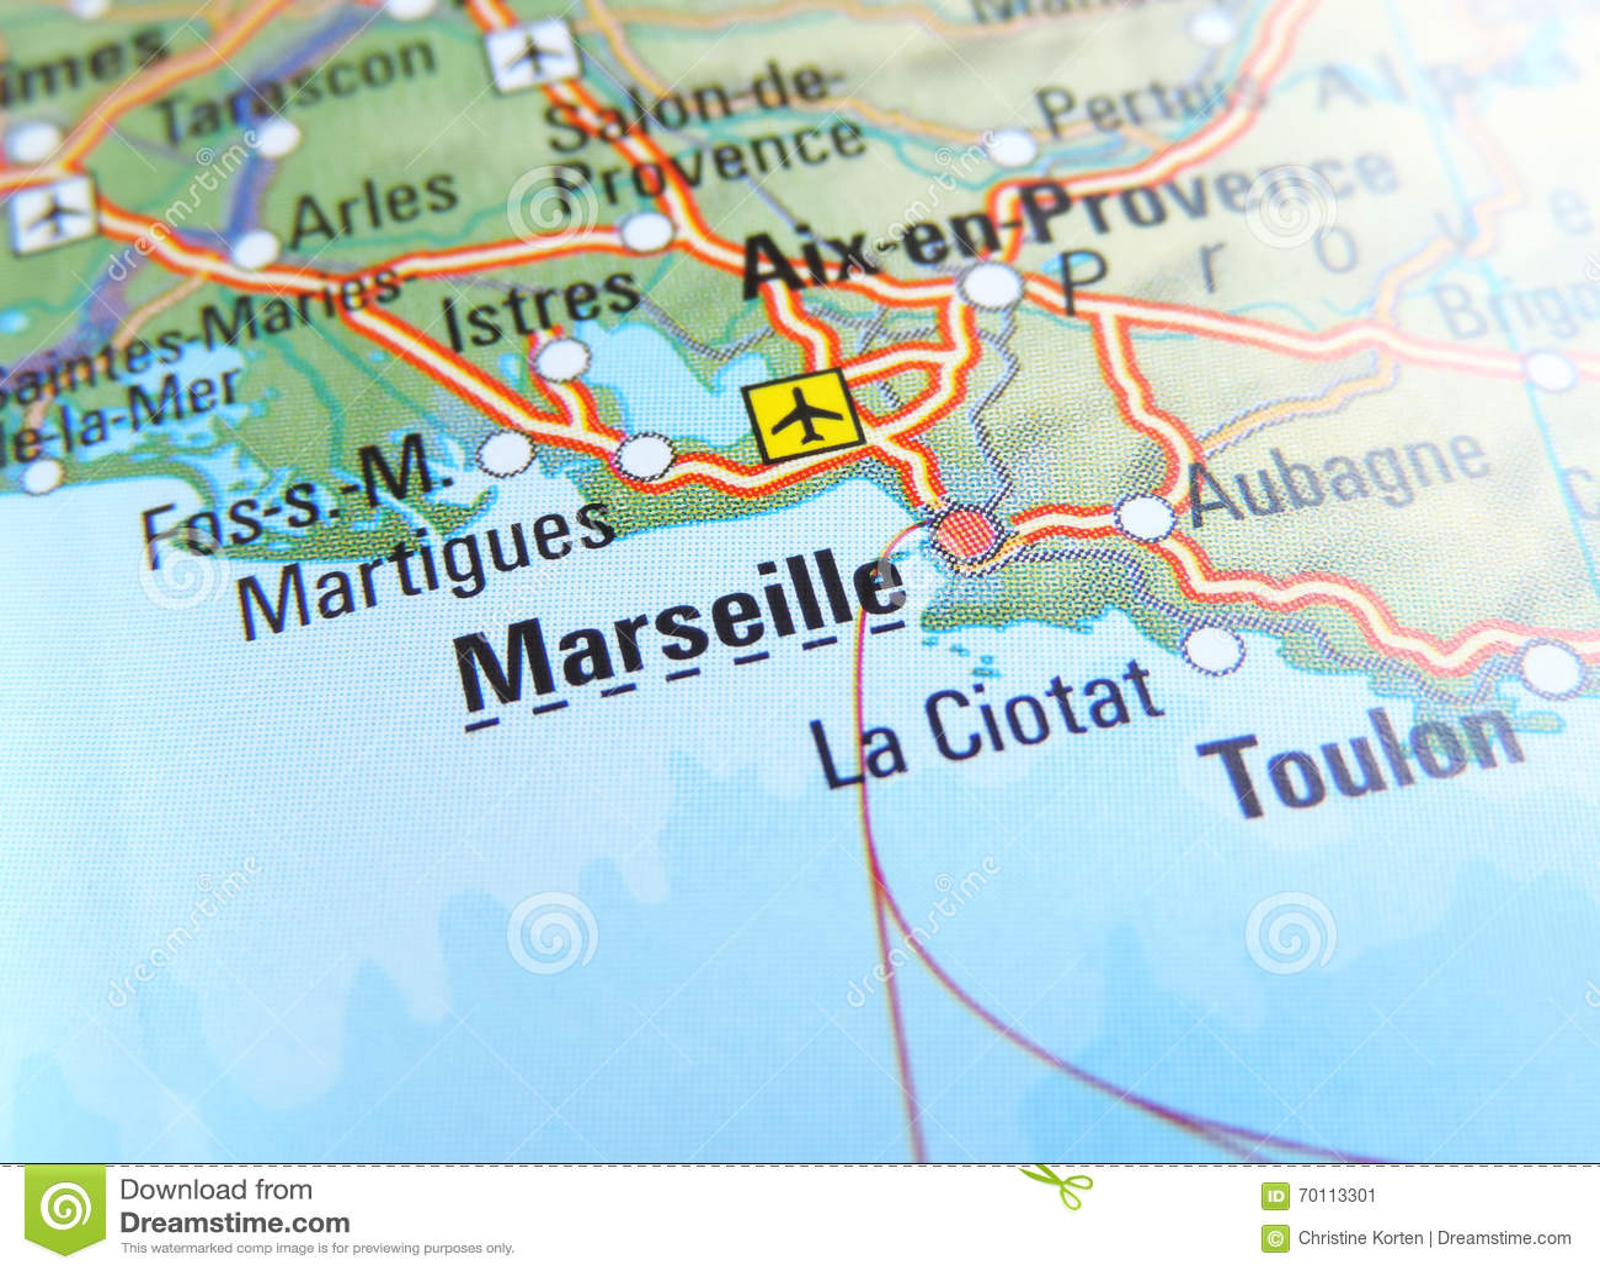 marselha mapa Mapa de Marselha imagem de stock. Imagem de aeroporto   70113301 marselha mapa